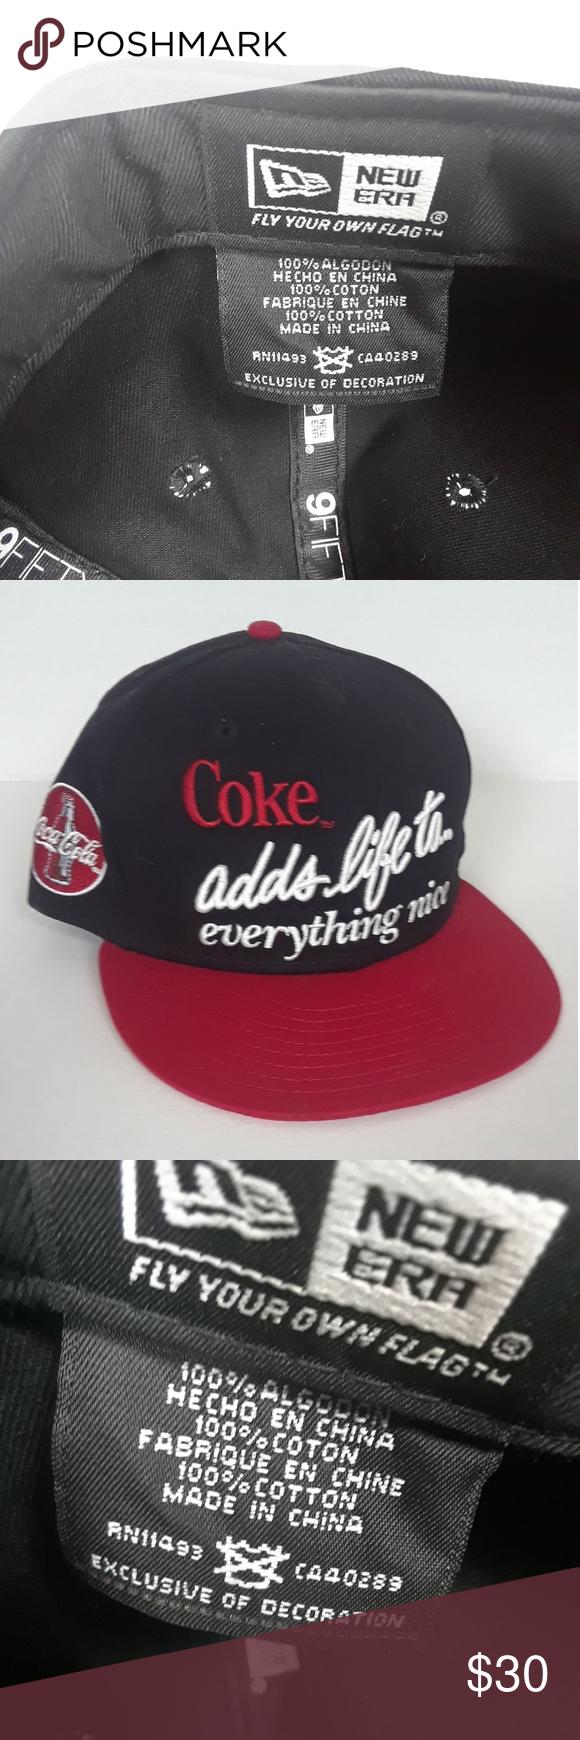 New Era Coke Coca-Cola Baseball Cap Embroidered Super cool embroidered coke  cap Excellent condition never worn New Era Accessories Hats 9395c8b02f66